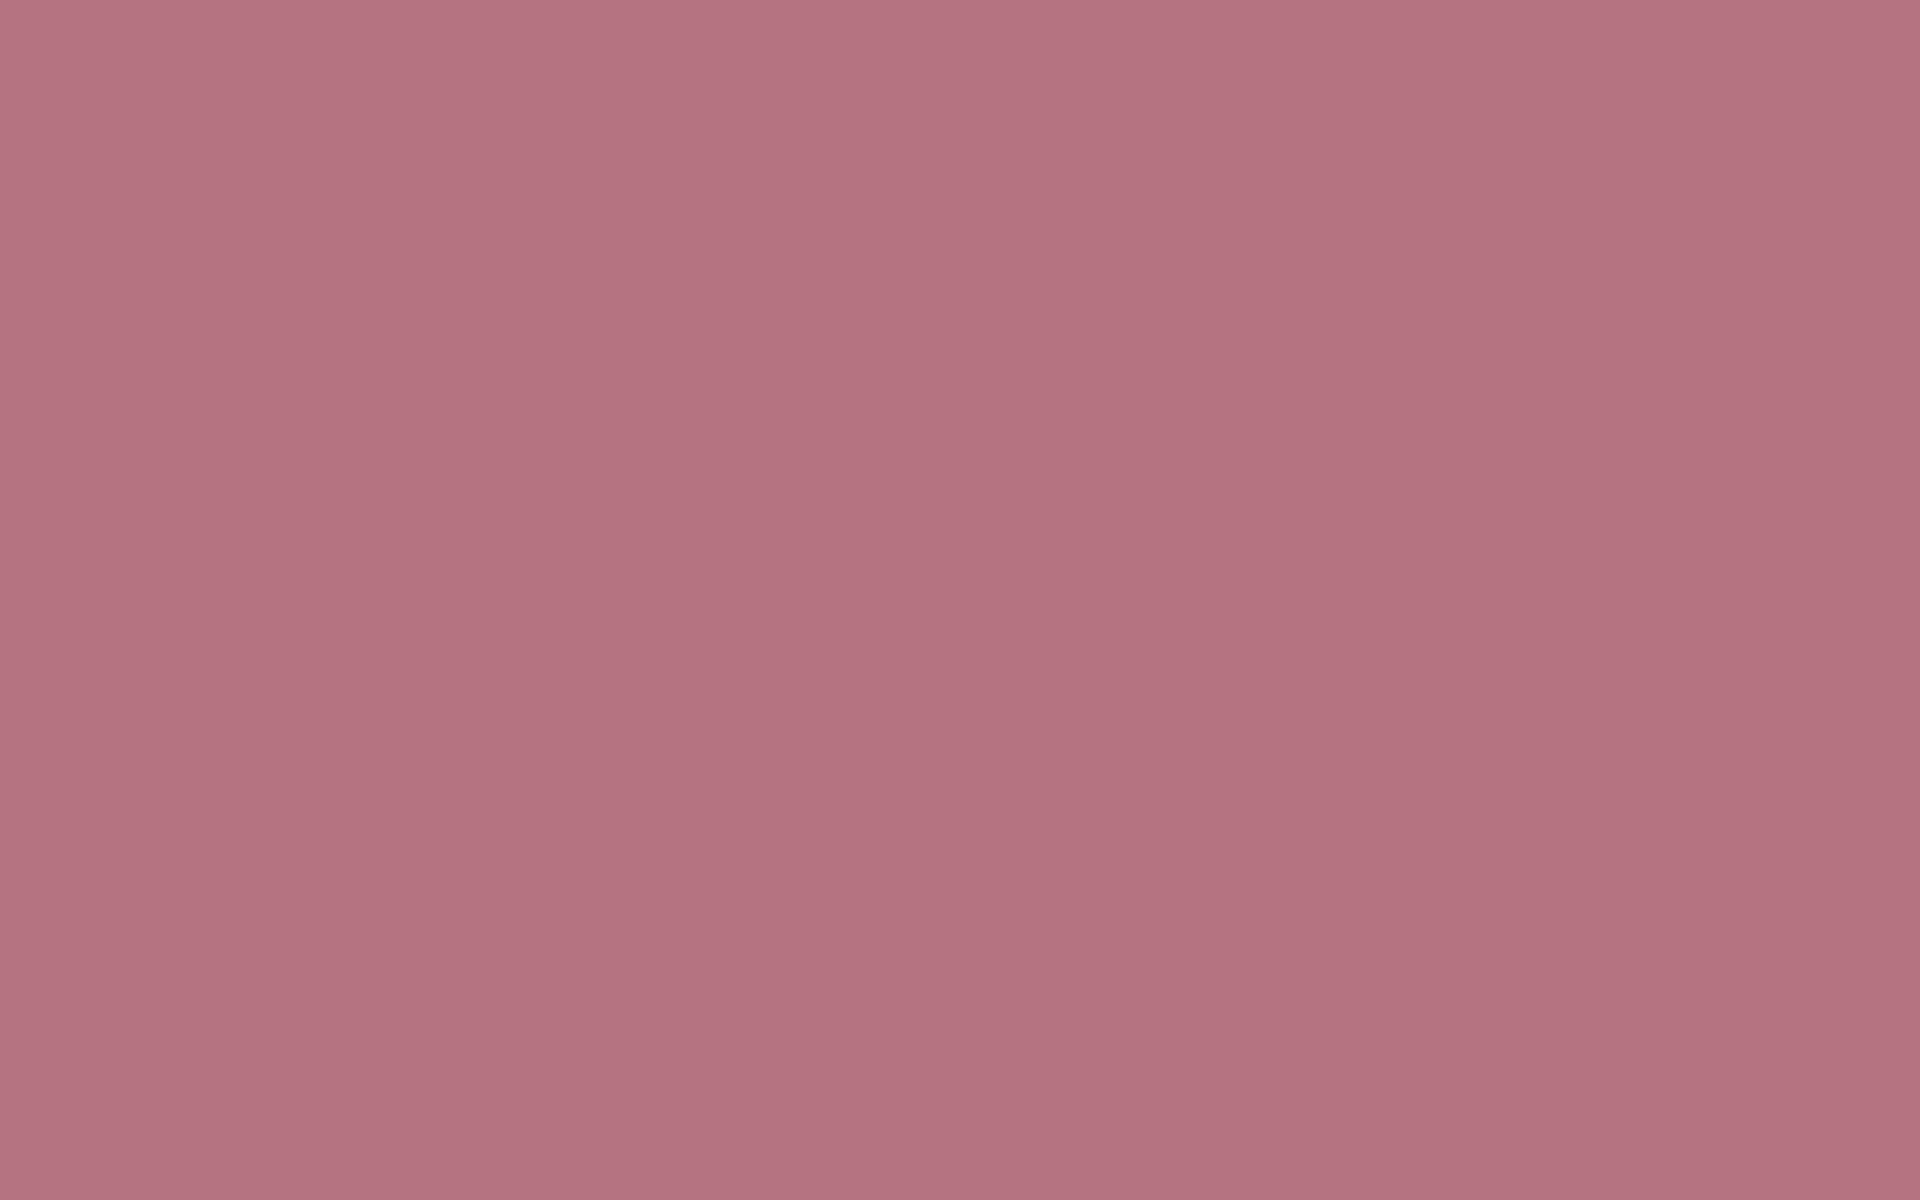 1920x1200 Turkish Rose Solid Color Background